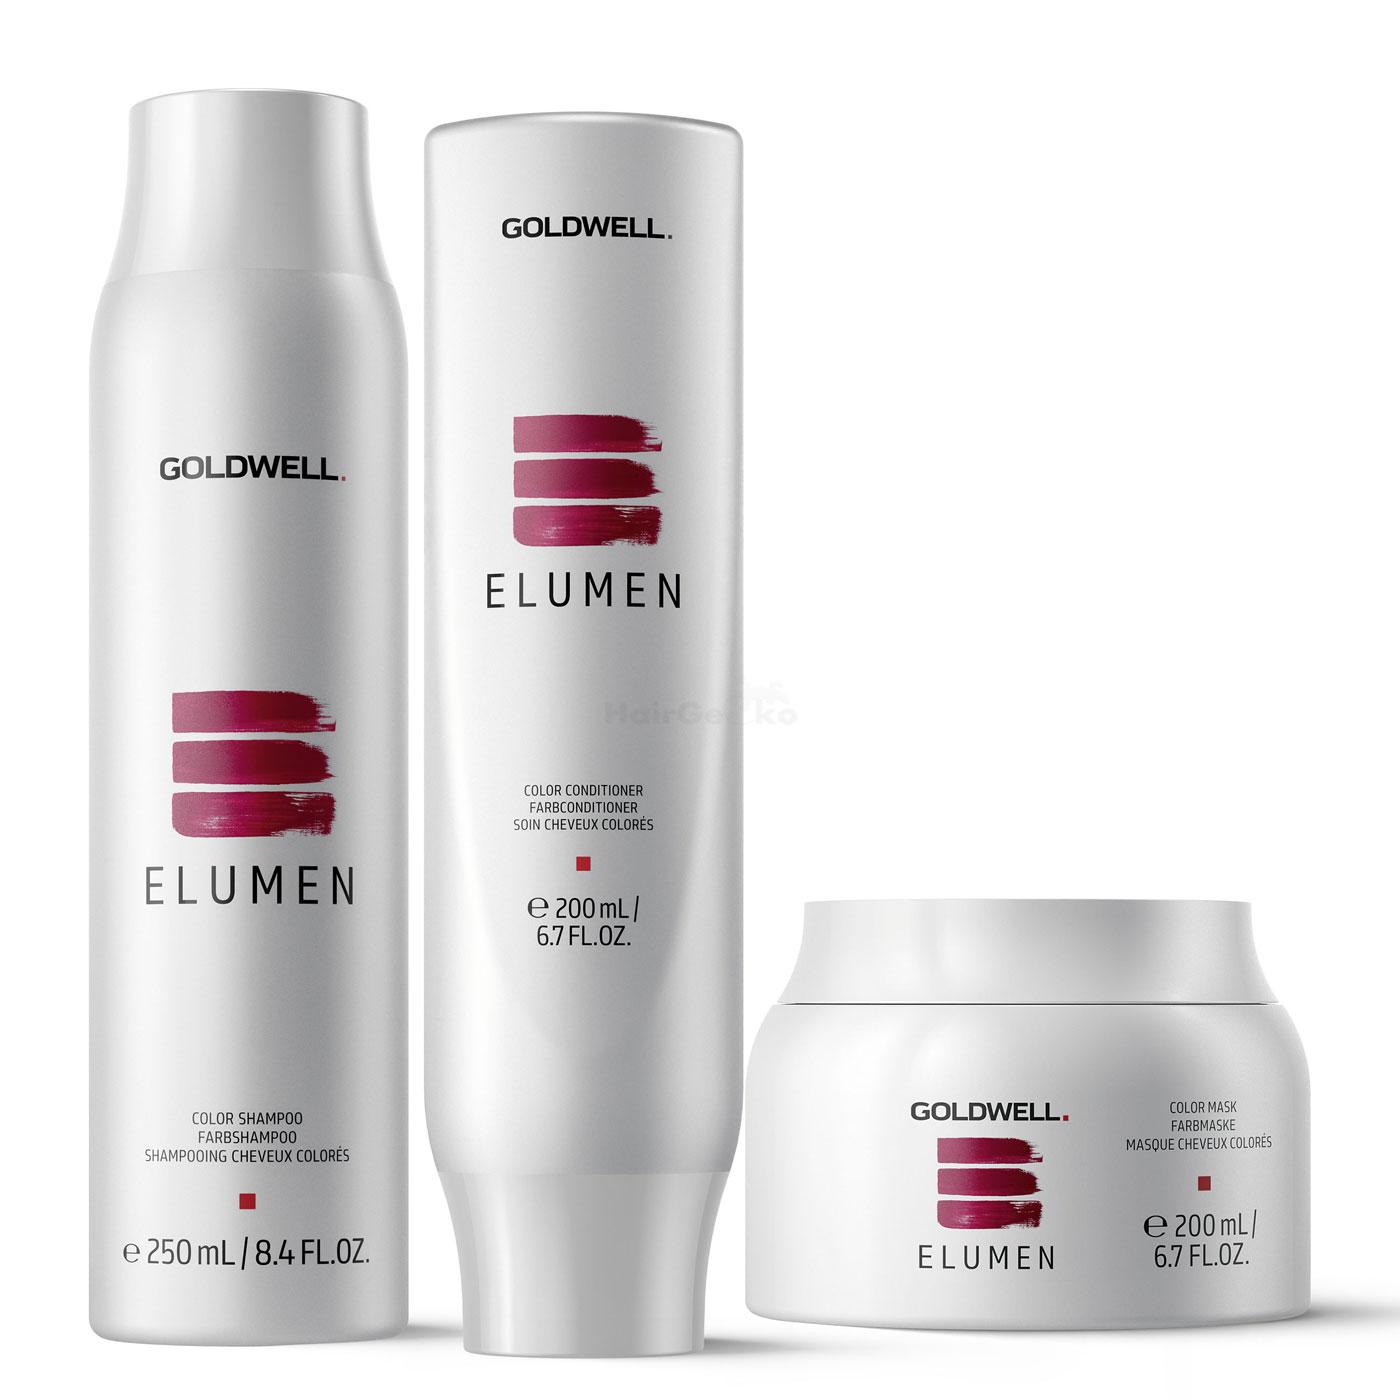 Goldwell Elumen Care Set - Shampoo Farbshampoo 250ml + Conditioner Farbconditioner 200ml + Mask Farbmaske 200ml